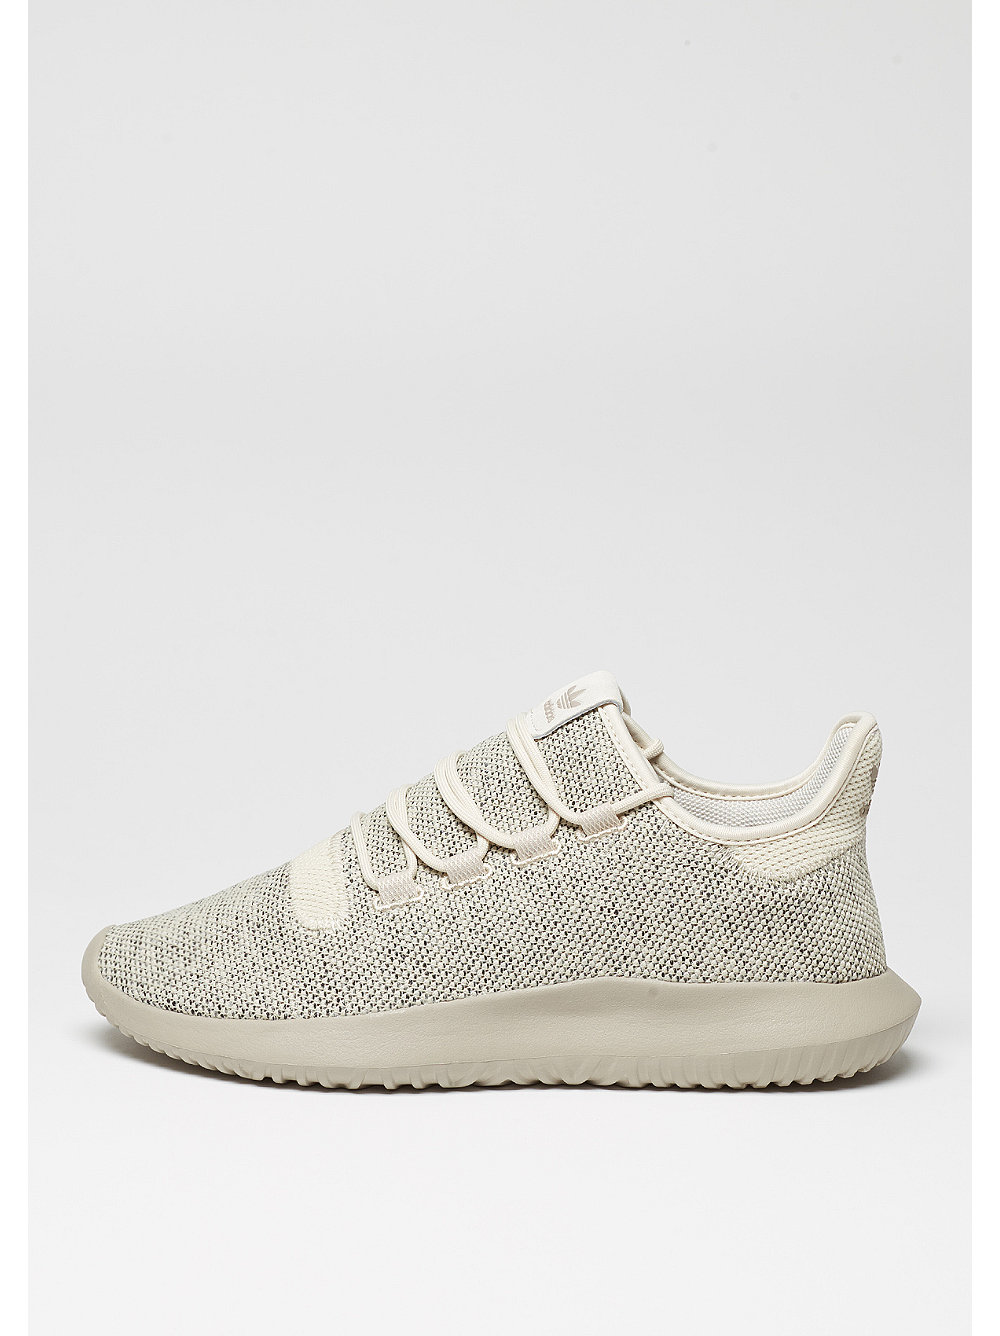 adidas Tubular Shadow 3D Knit light brown im SNIPES Onlineshop